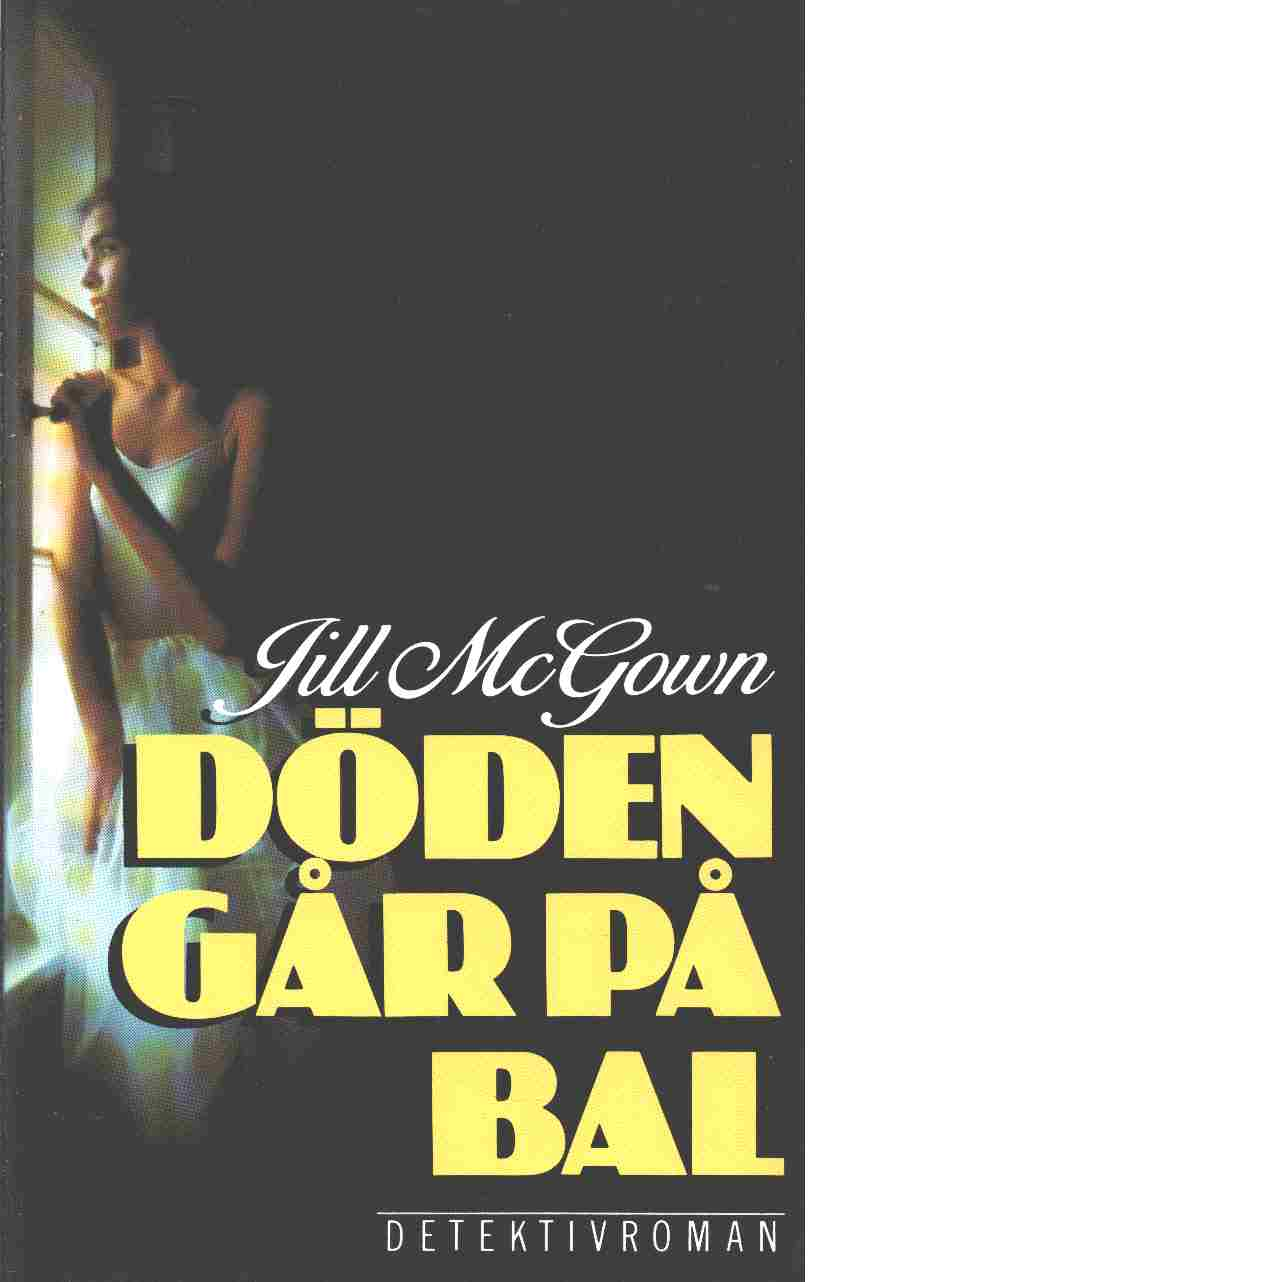 Döden går på bal : [detektivroman] - McGown, Jill